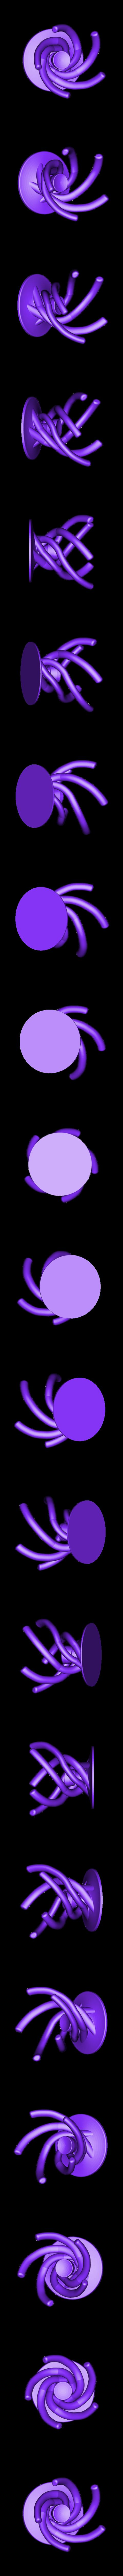 Coquetier_2.stl Download STL file Bioinspired Egg cup • 3D printer template, 3d-fabric-jean-pierre